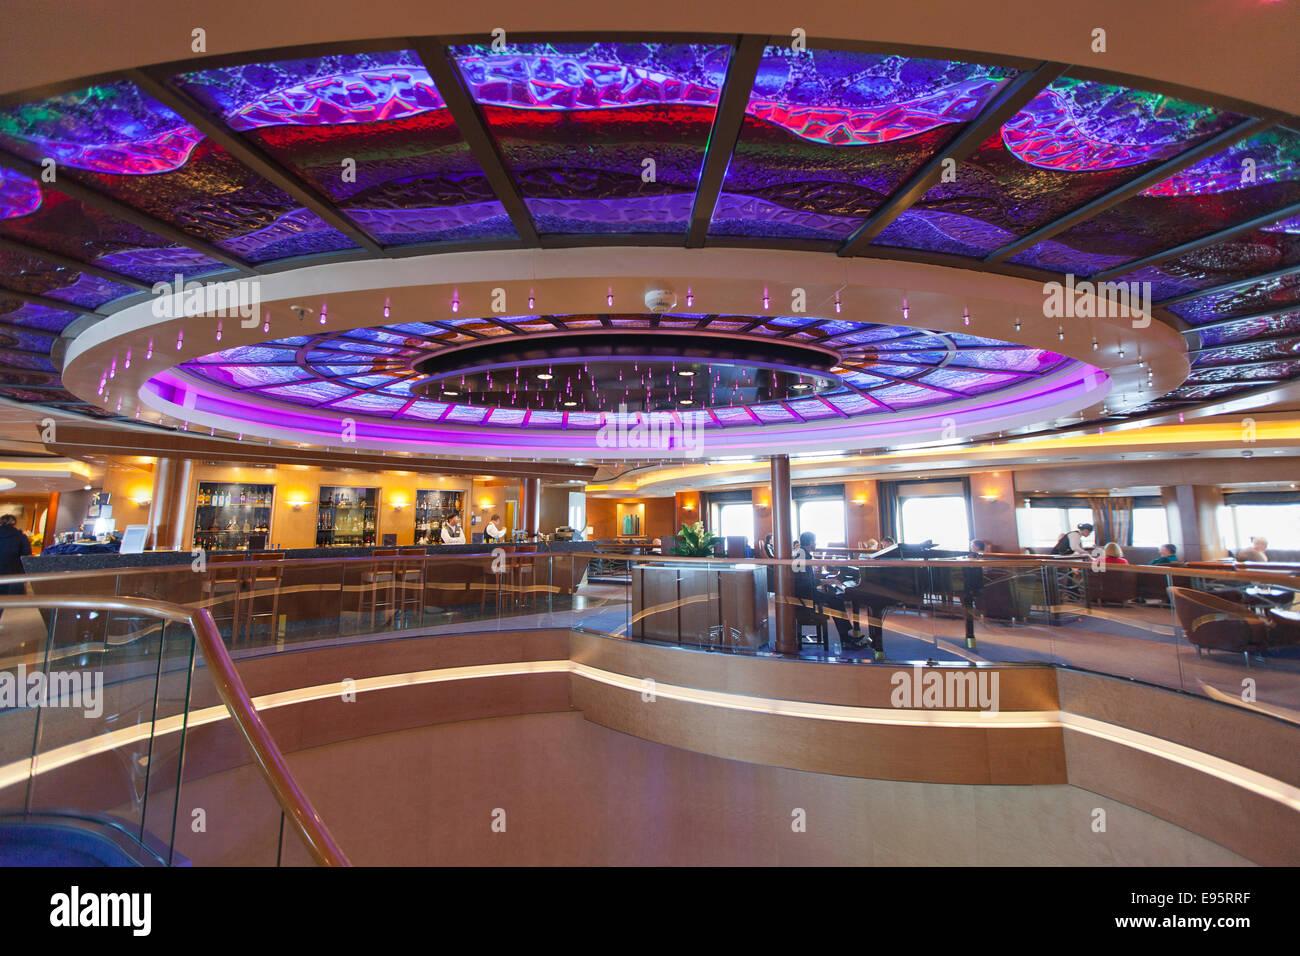 Interior Of Arcadia The P Amp O Cruise Ship Stock Photo Royalty Free Image 74501827 Alamy